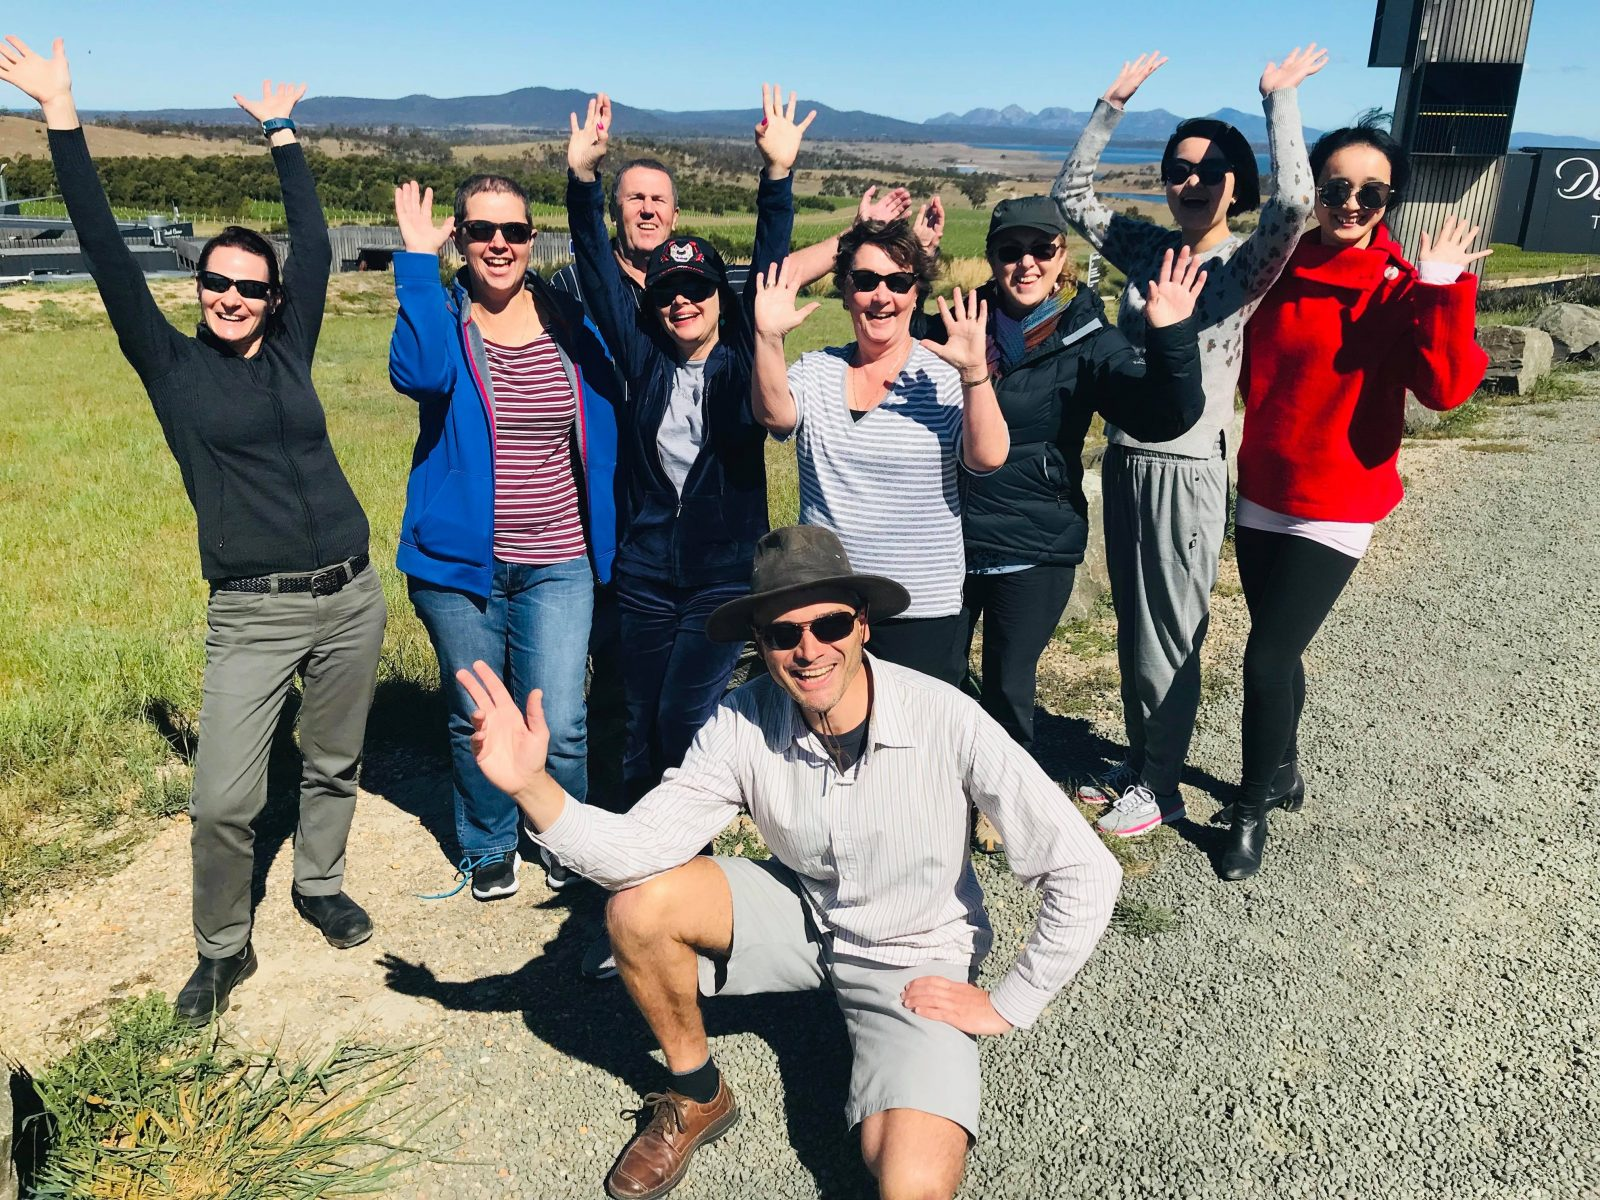 A tour group in Tasmania waving